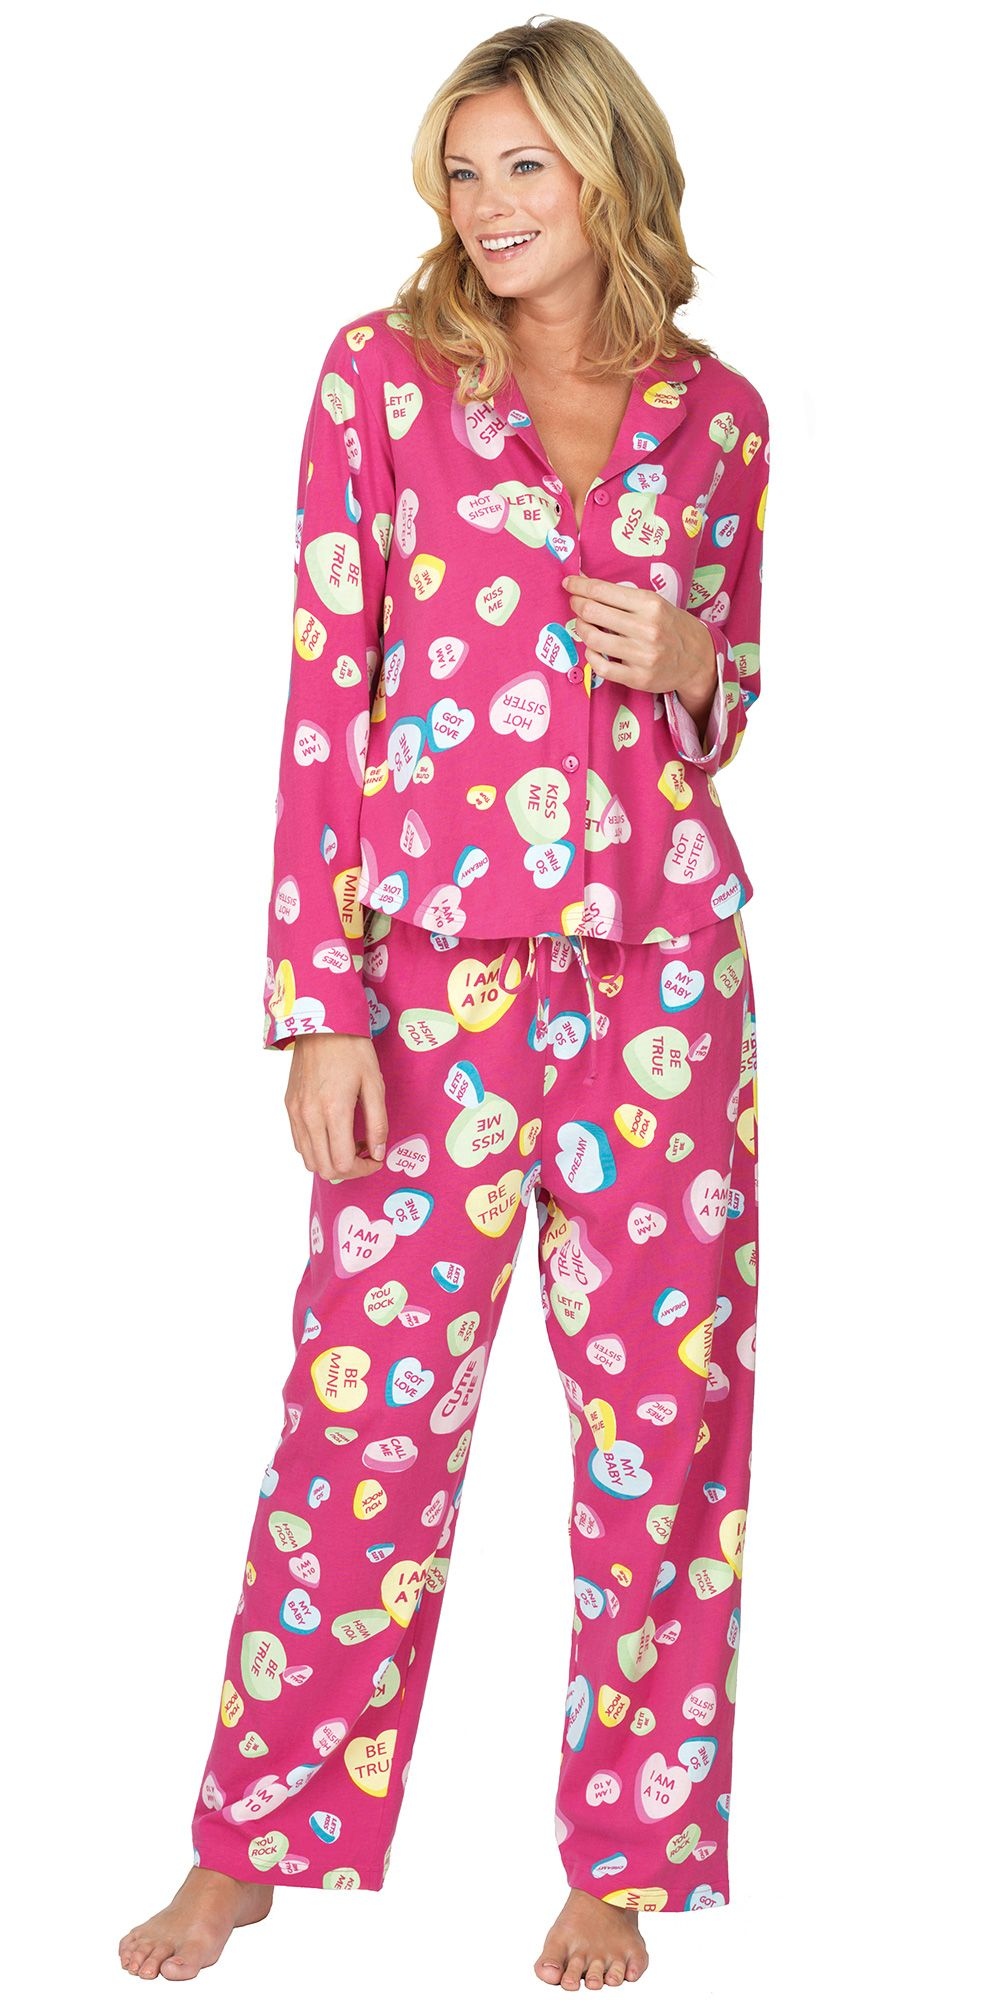 conversation heart boyfriend pjs valentines day pajamas from pajamagram 5999 valentinesday hearts - Valentines Day Pajamas